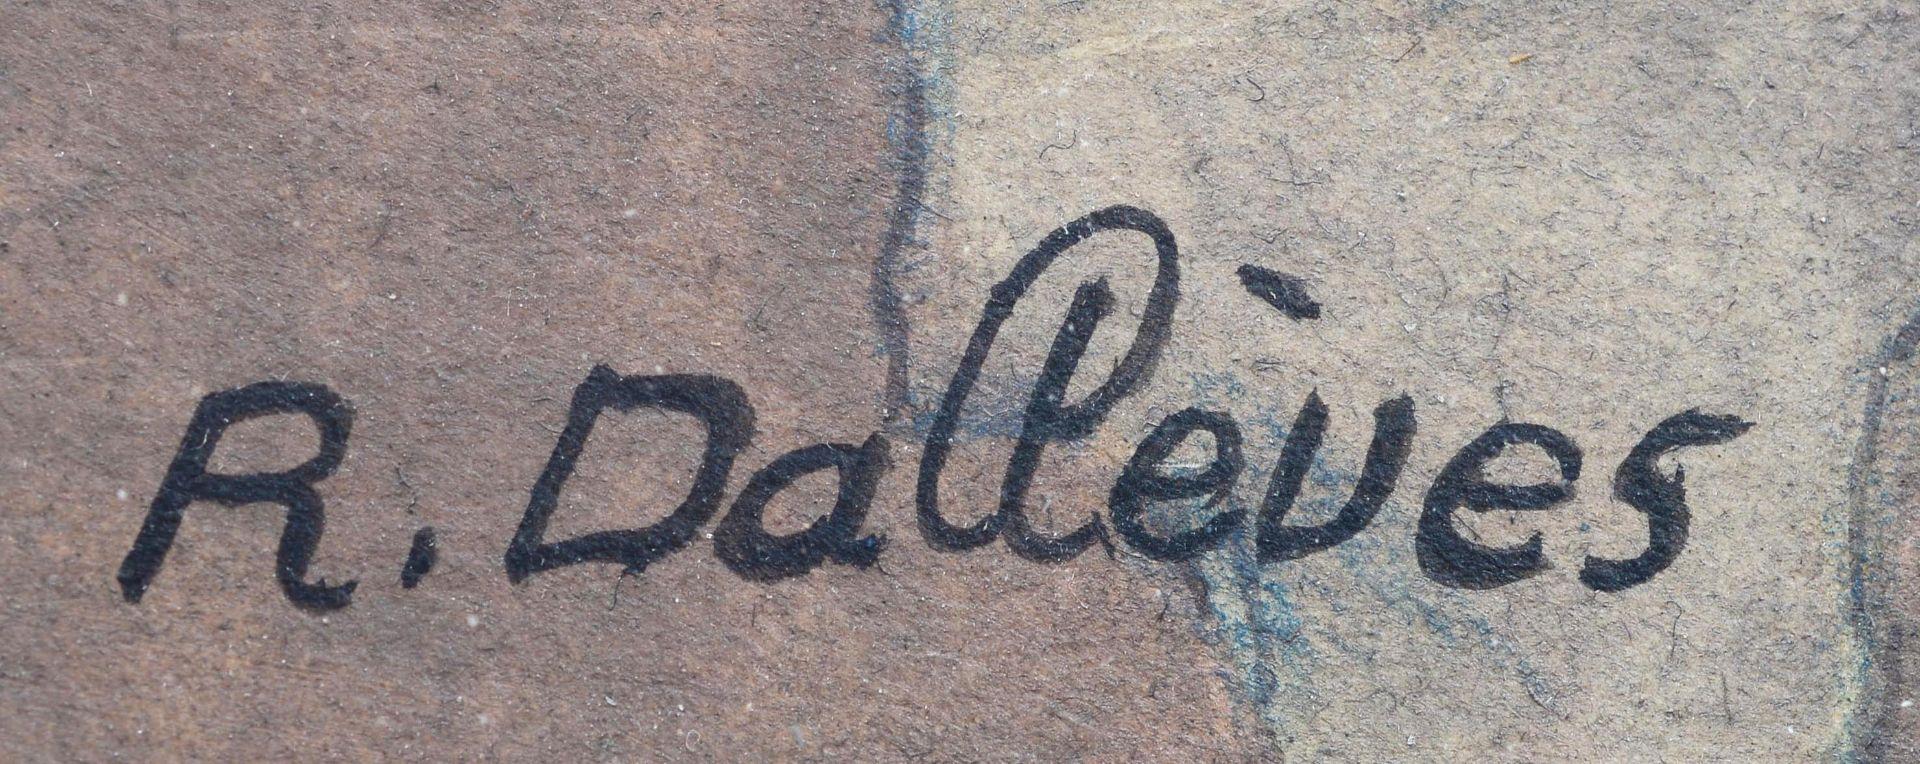 "DALLÈVES, RAPHY: ""Après l'office (Hérémence)"". - Image 5 of 6"